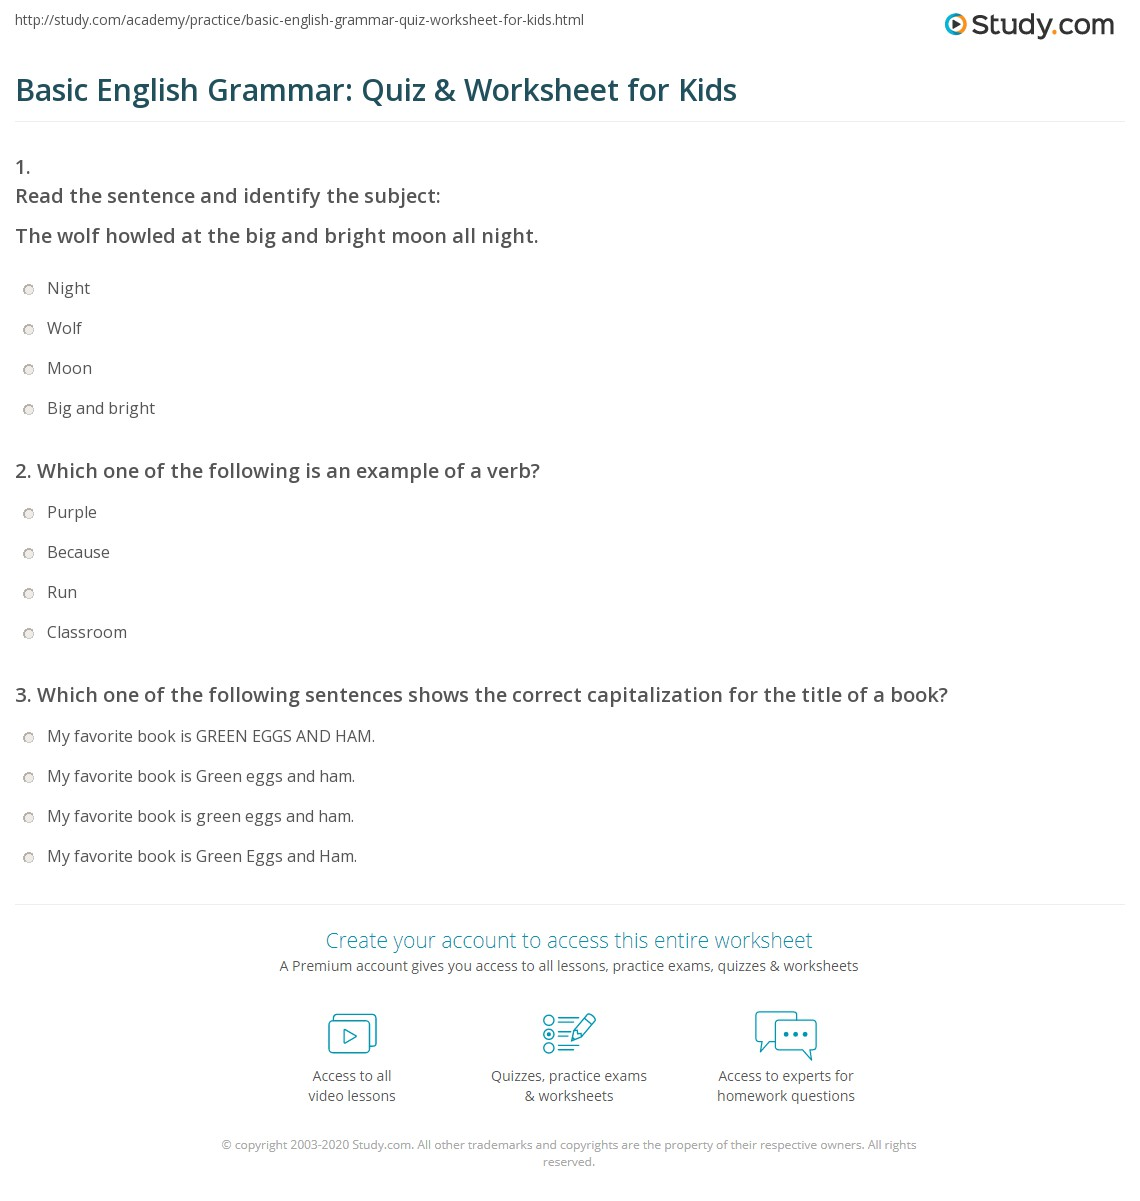 Basic English Grammar: Quiz & Worksheet for Kids | Study.com